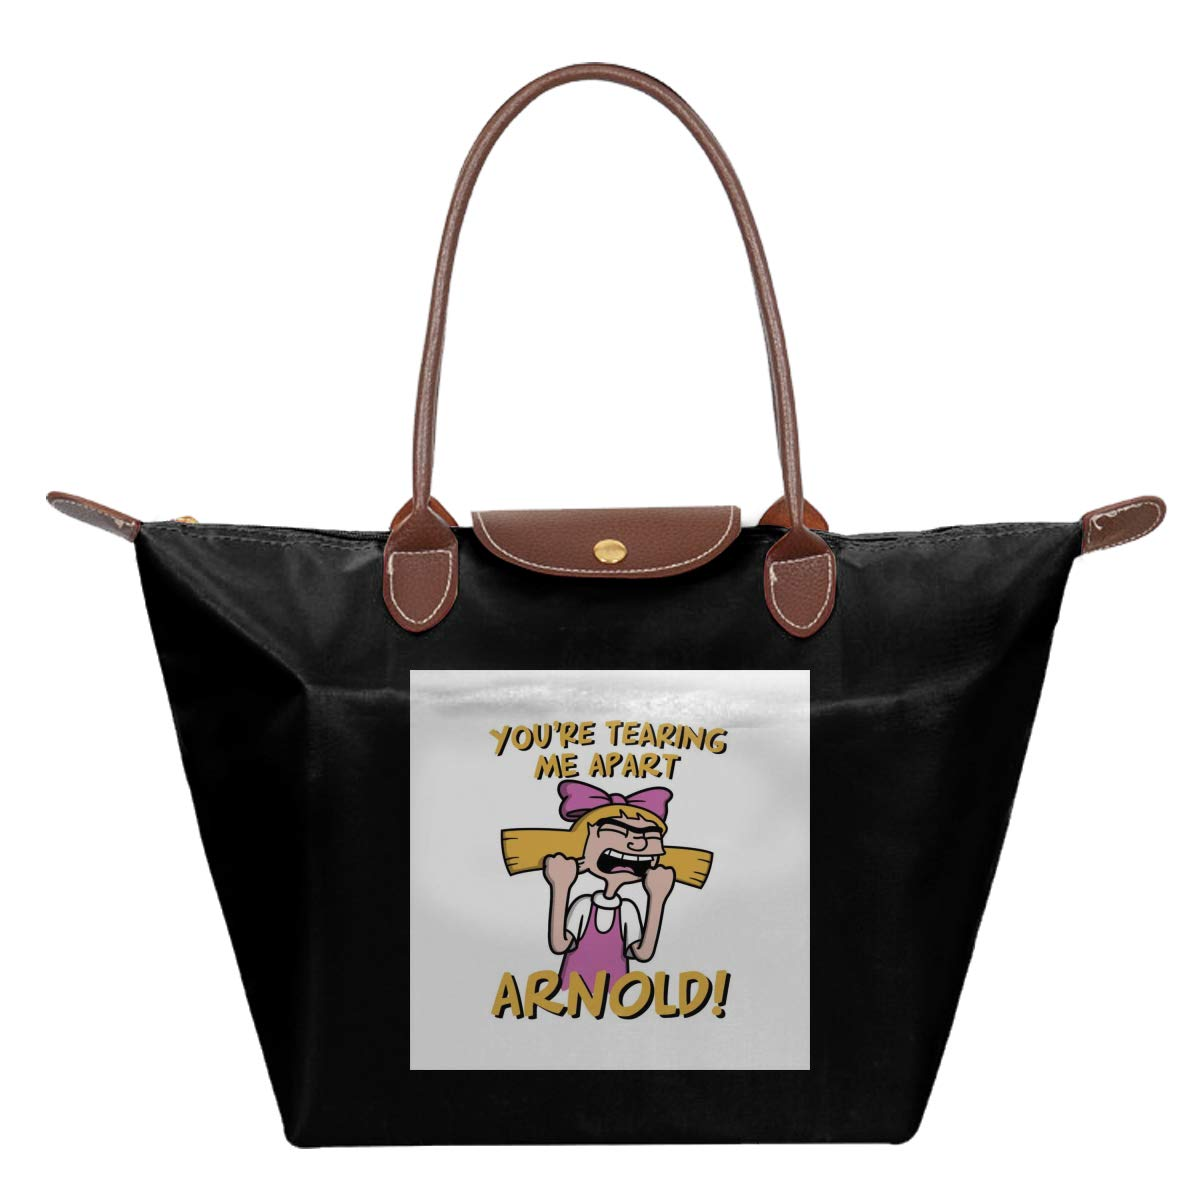 Hey Arnold Youre Tearing Me Apart Helga Room Waterproof Leather Folded Messenger Nylon Bag Travel Tote Hopping Folding School Handbags